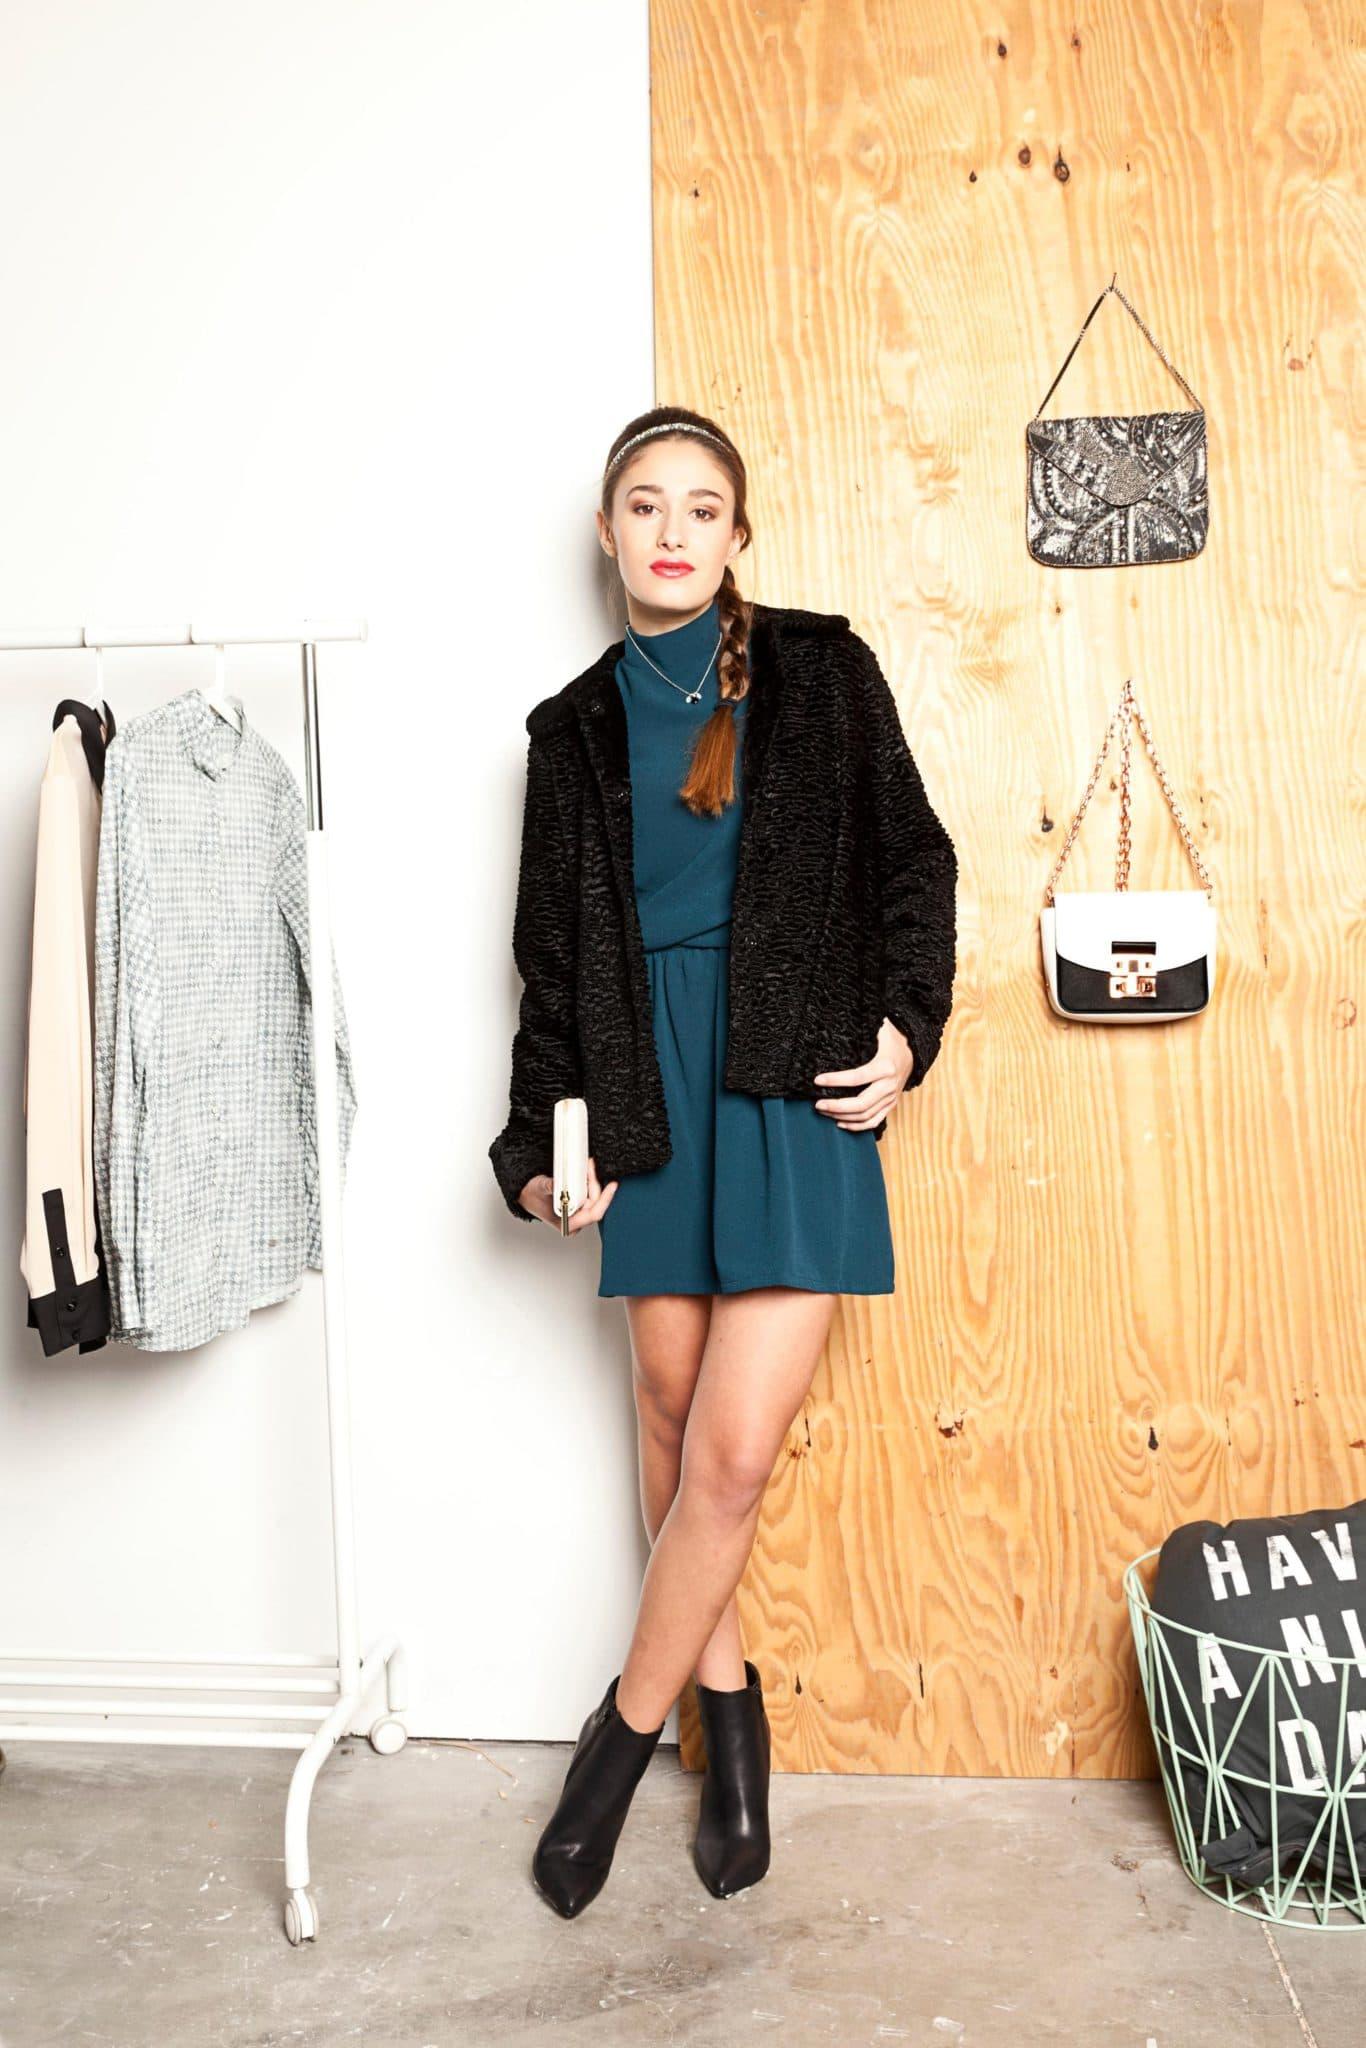 La Maison Victor, fashion, DYI, magazine, makeup artist